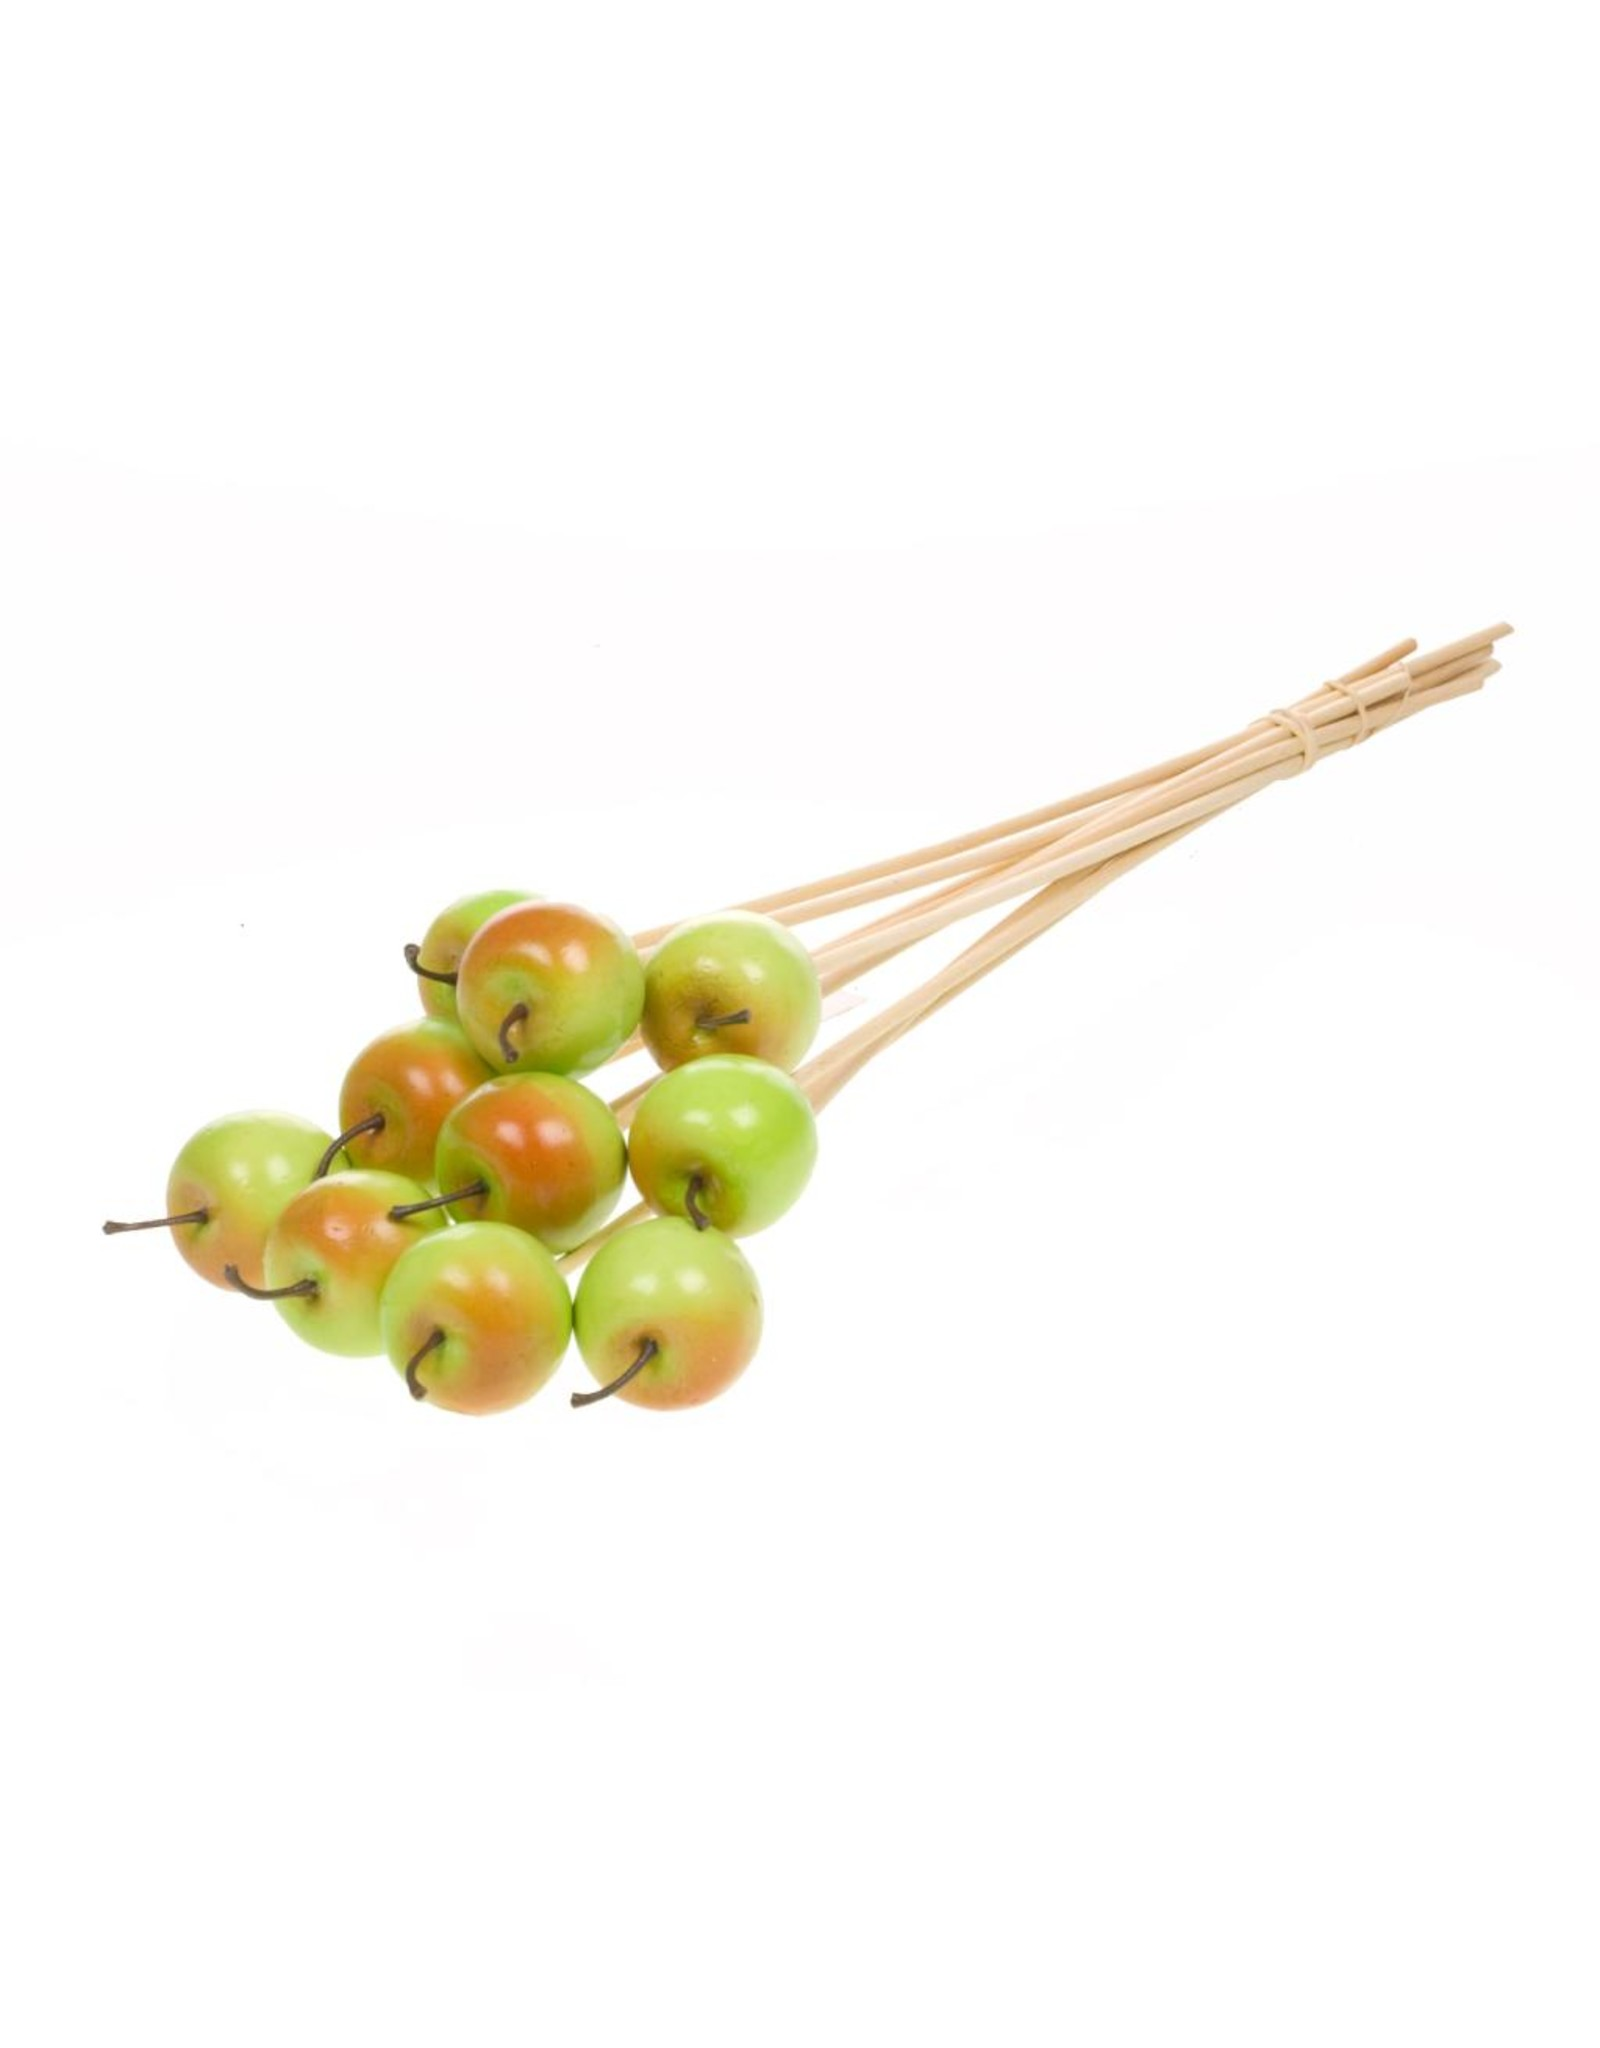 Apple 5cm o/s 10pc SB natural green x 4